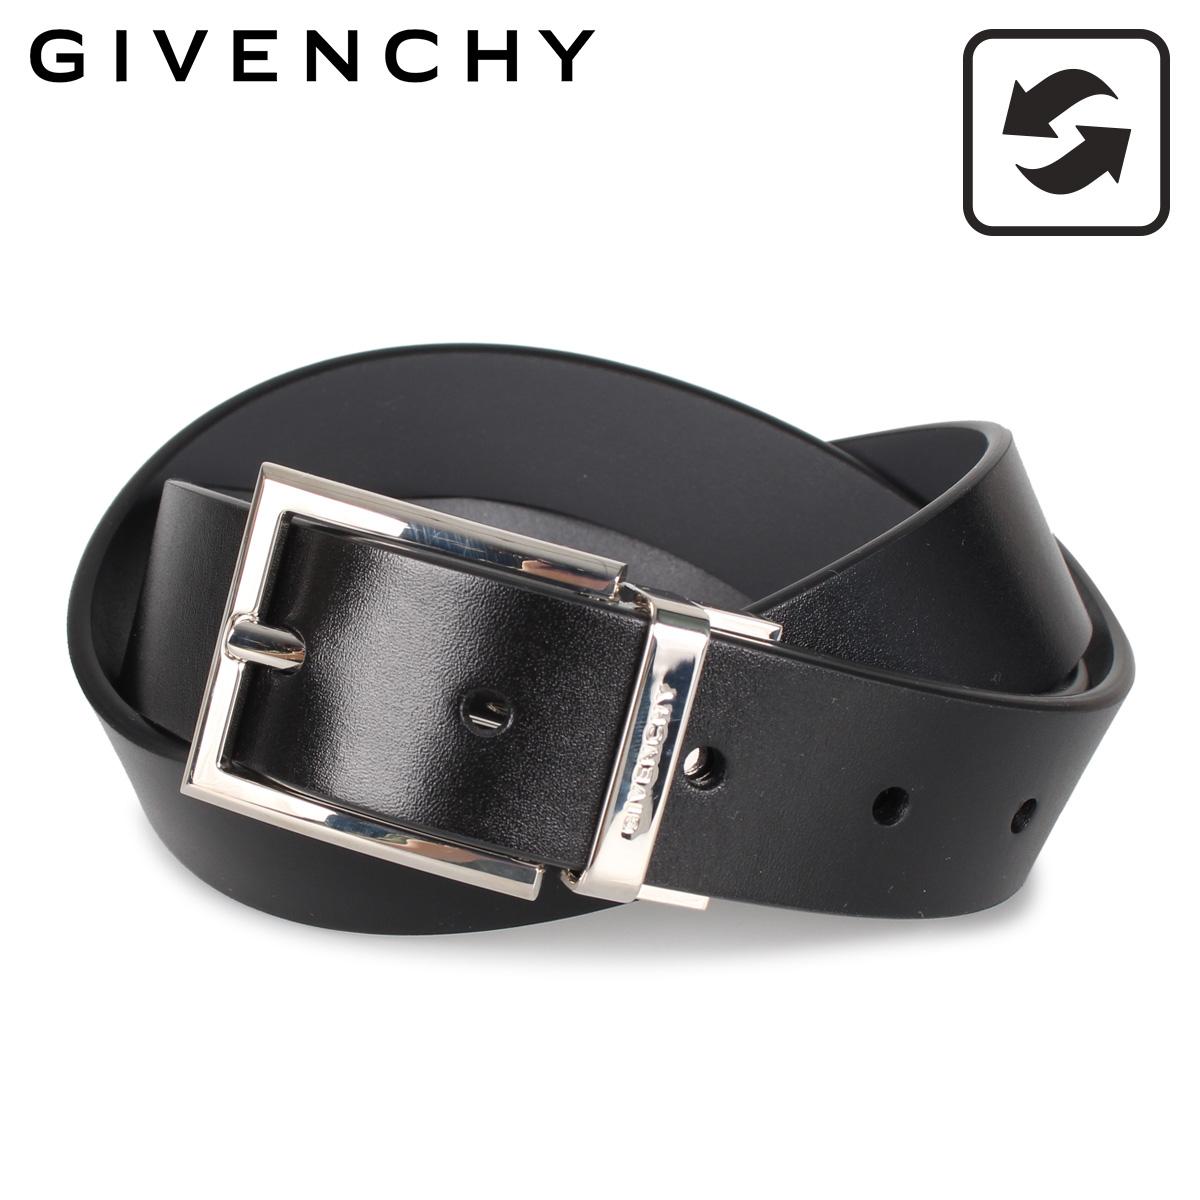 GIVENCHY ジバンシィ ベルト レザーベルト メンズ 本革 レザー リバーシブル ブラック グレー 黒 BK401K [3/9 新入荷]